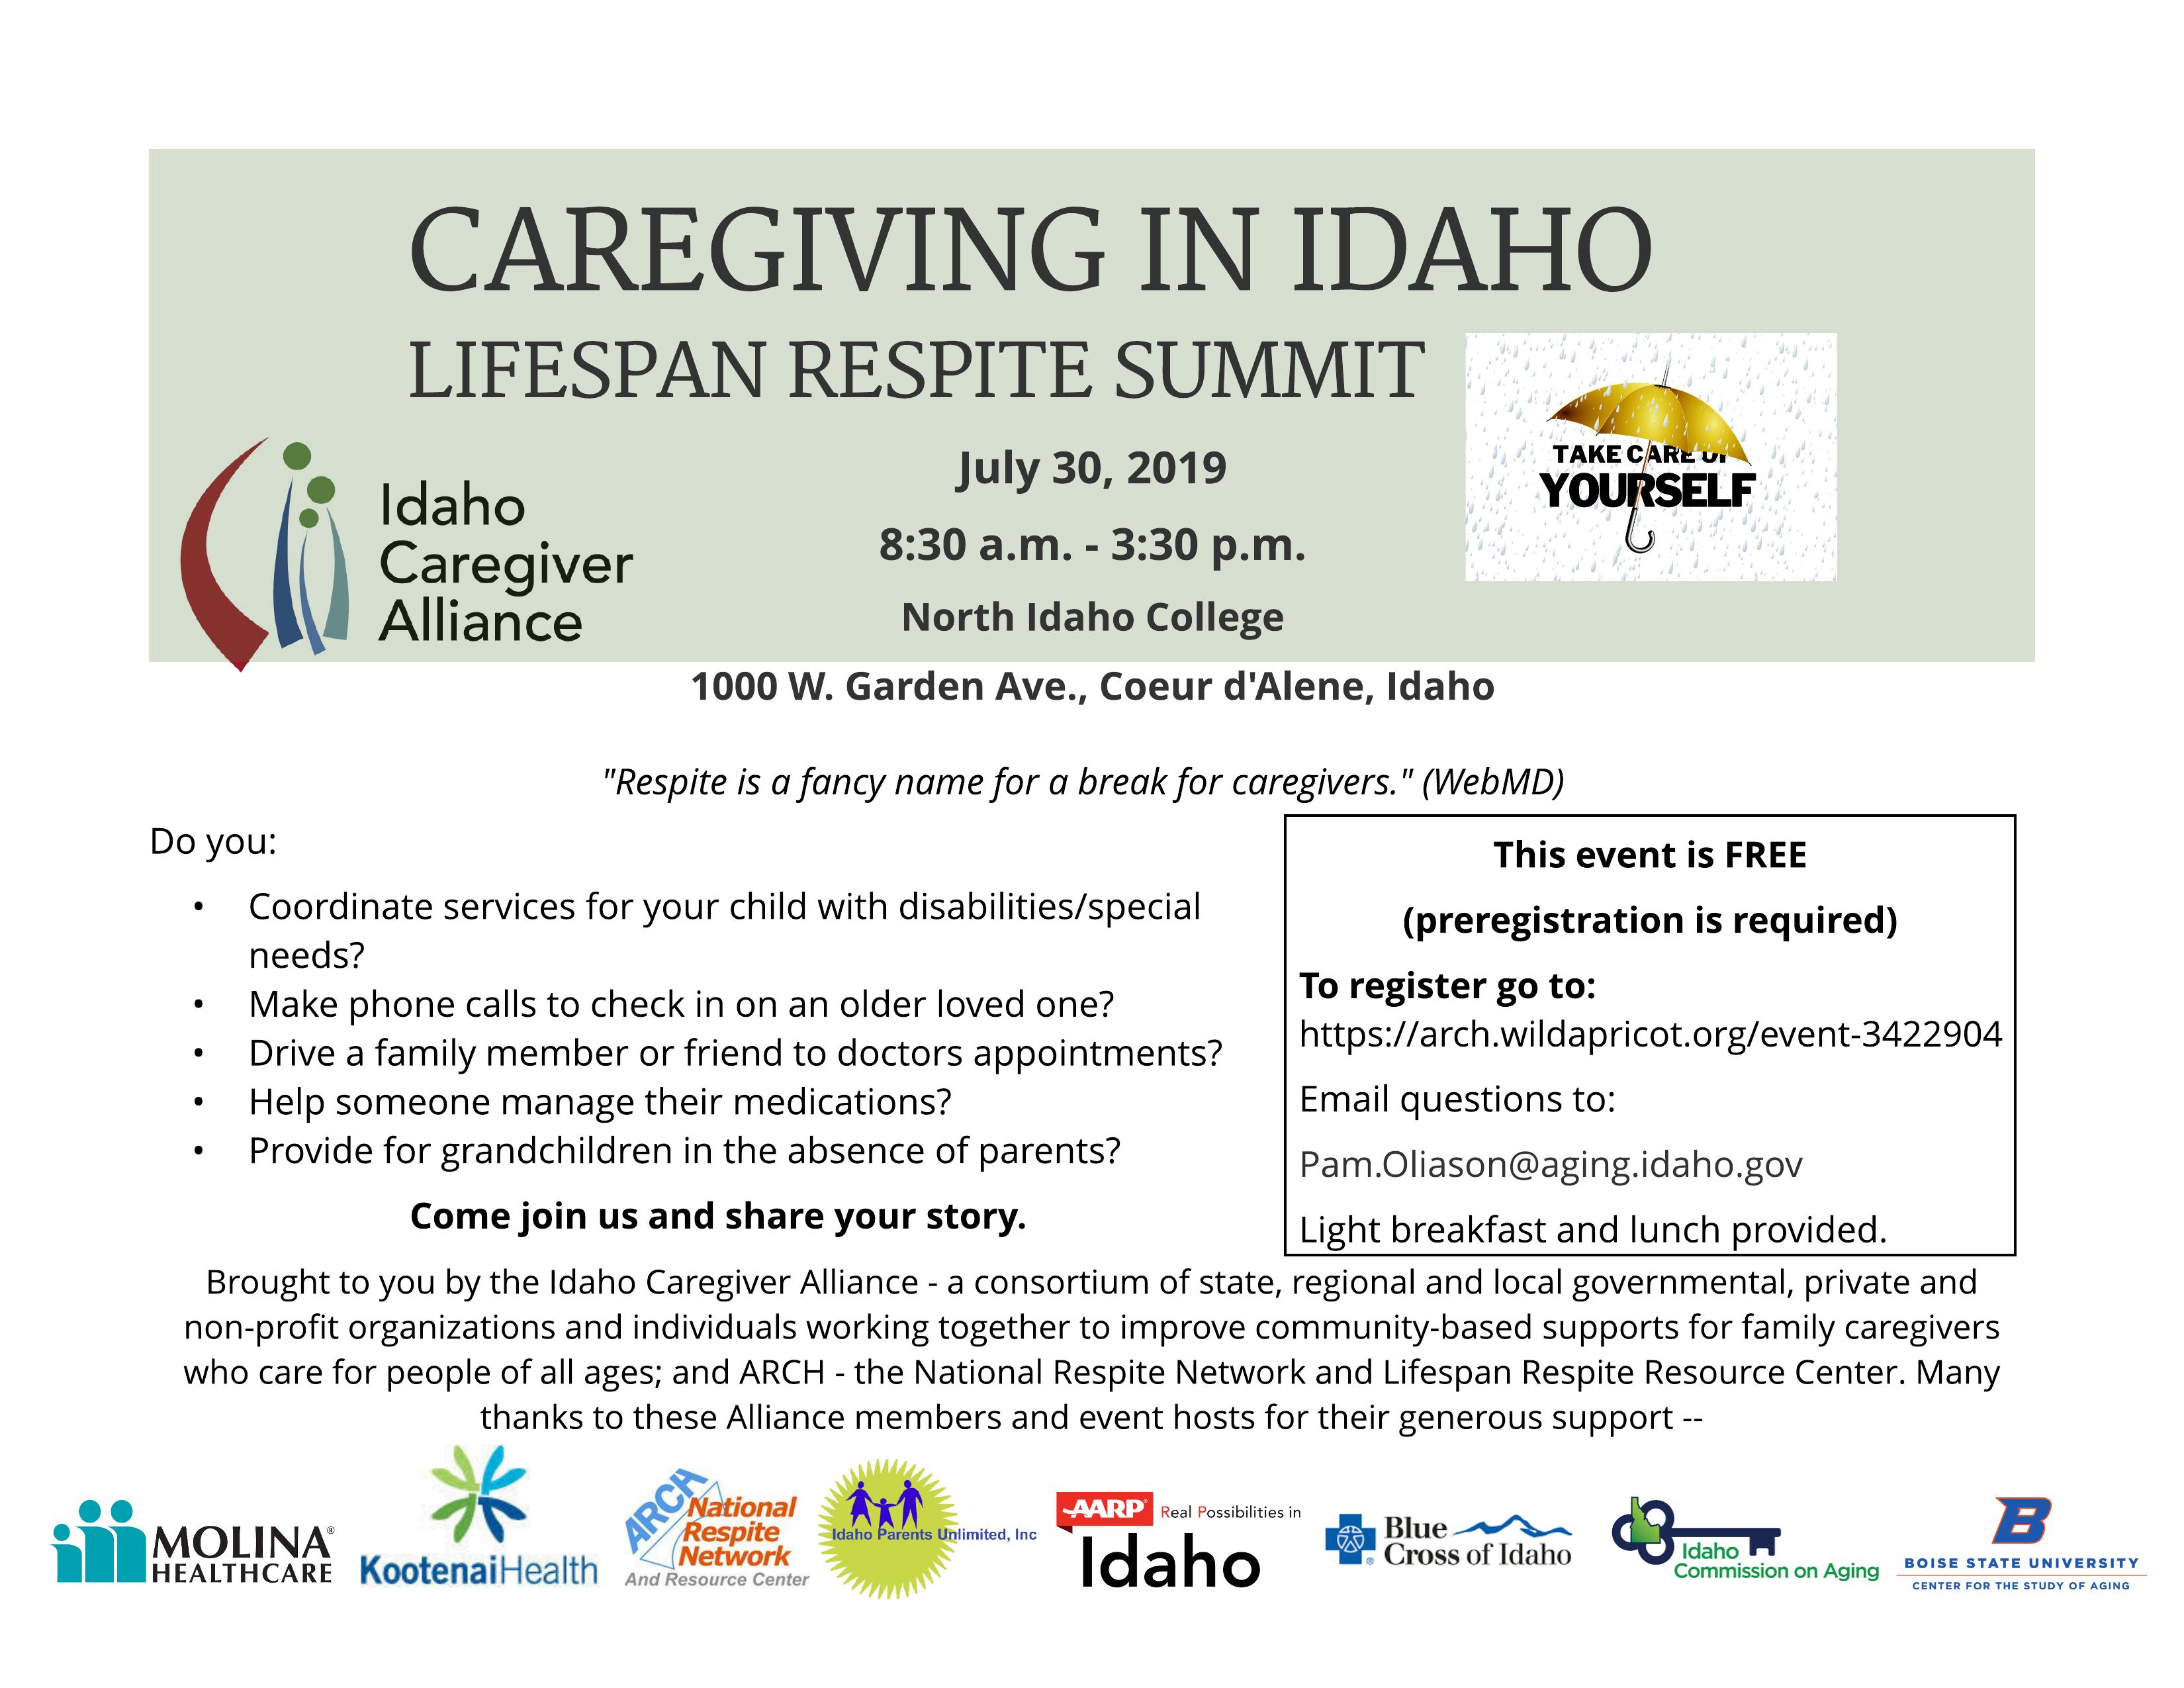 Caregiving in Idaho Lifespan Respite Summit – Northern Idaho